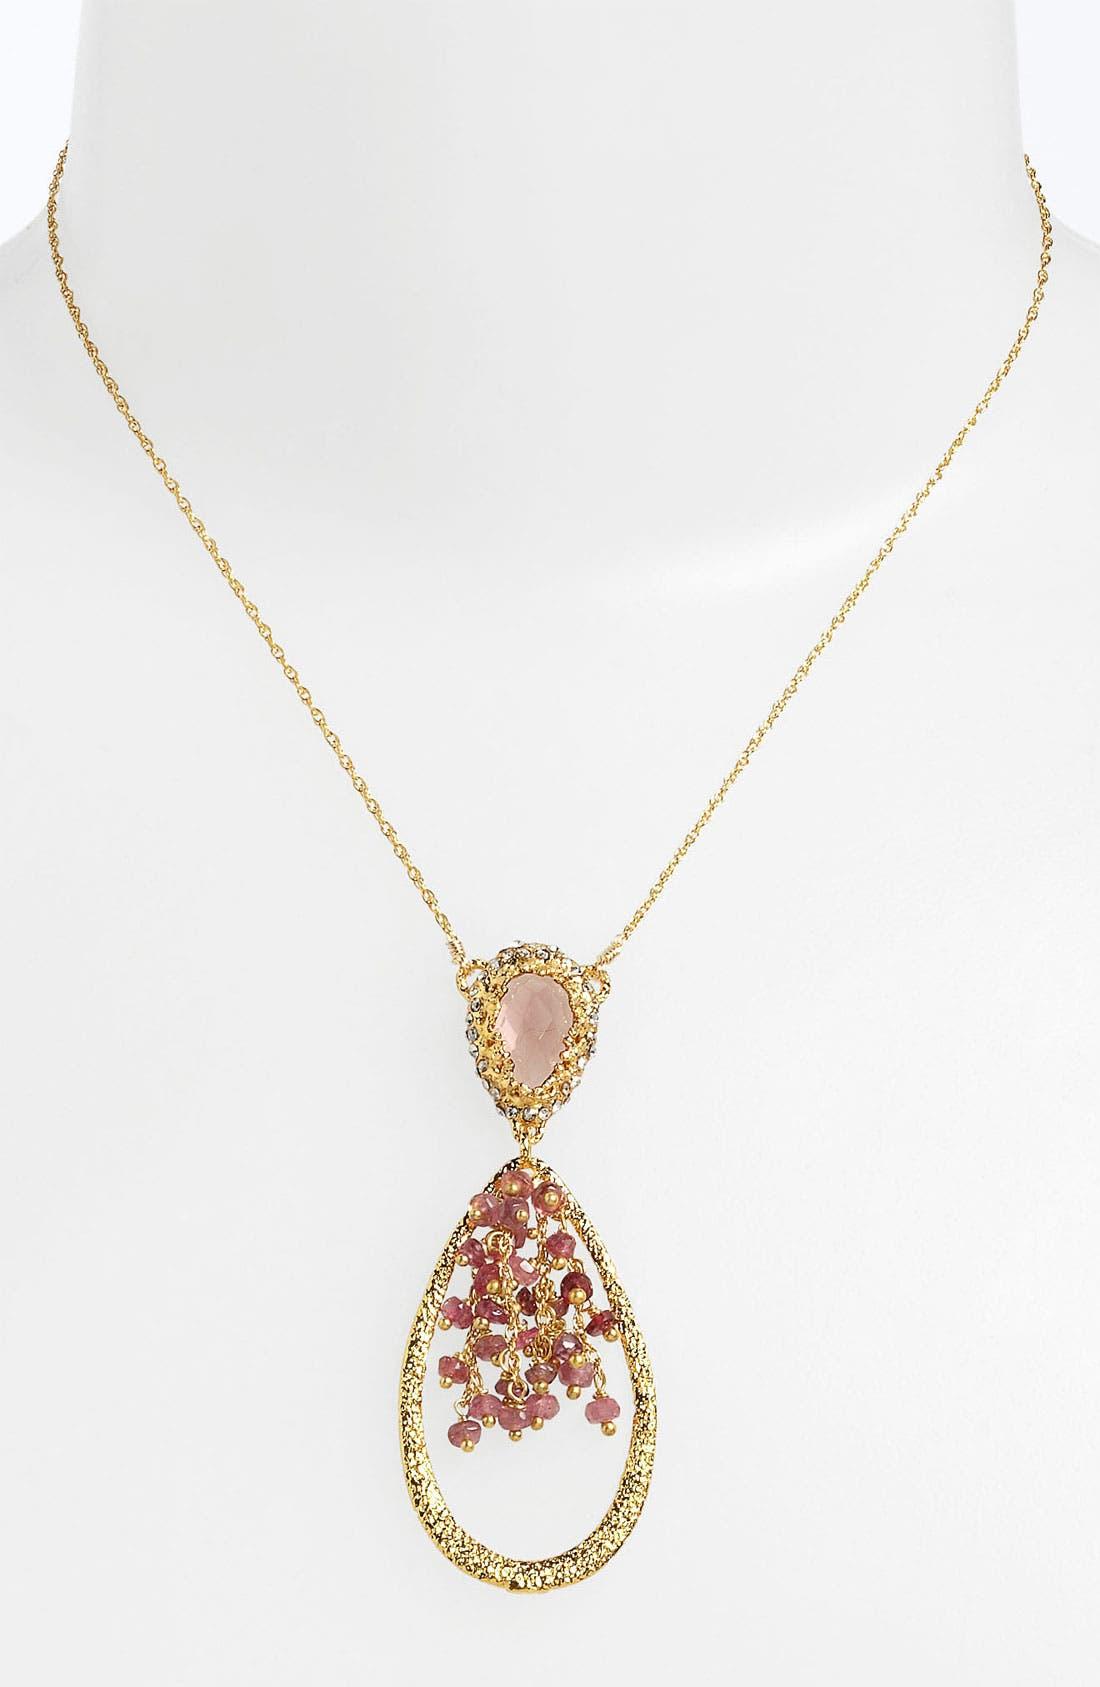 Alternate Image 1 Selected - Alexis Bittar 'Elements - Floral' Teardrop Pendant Necklace